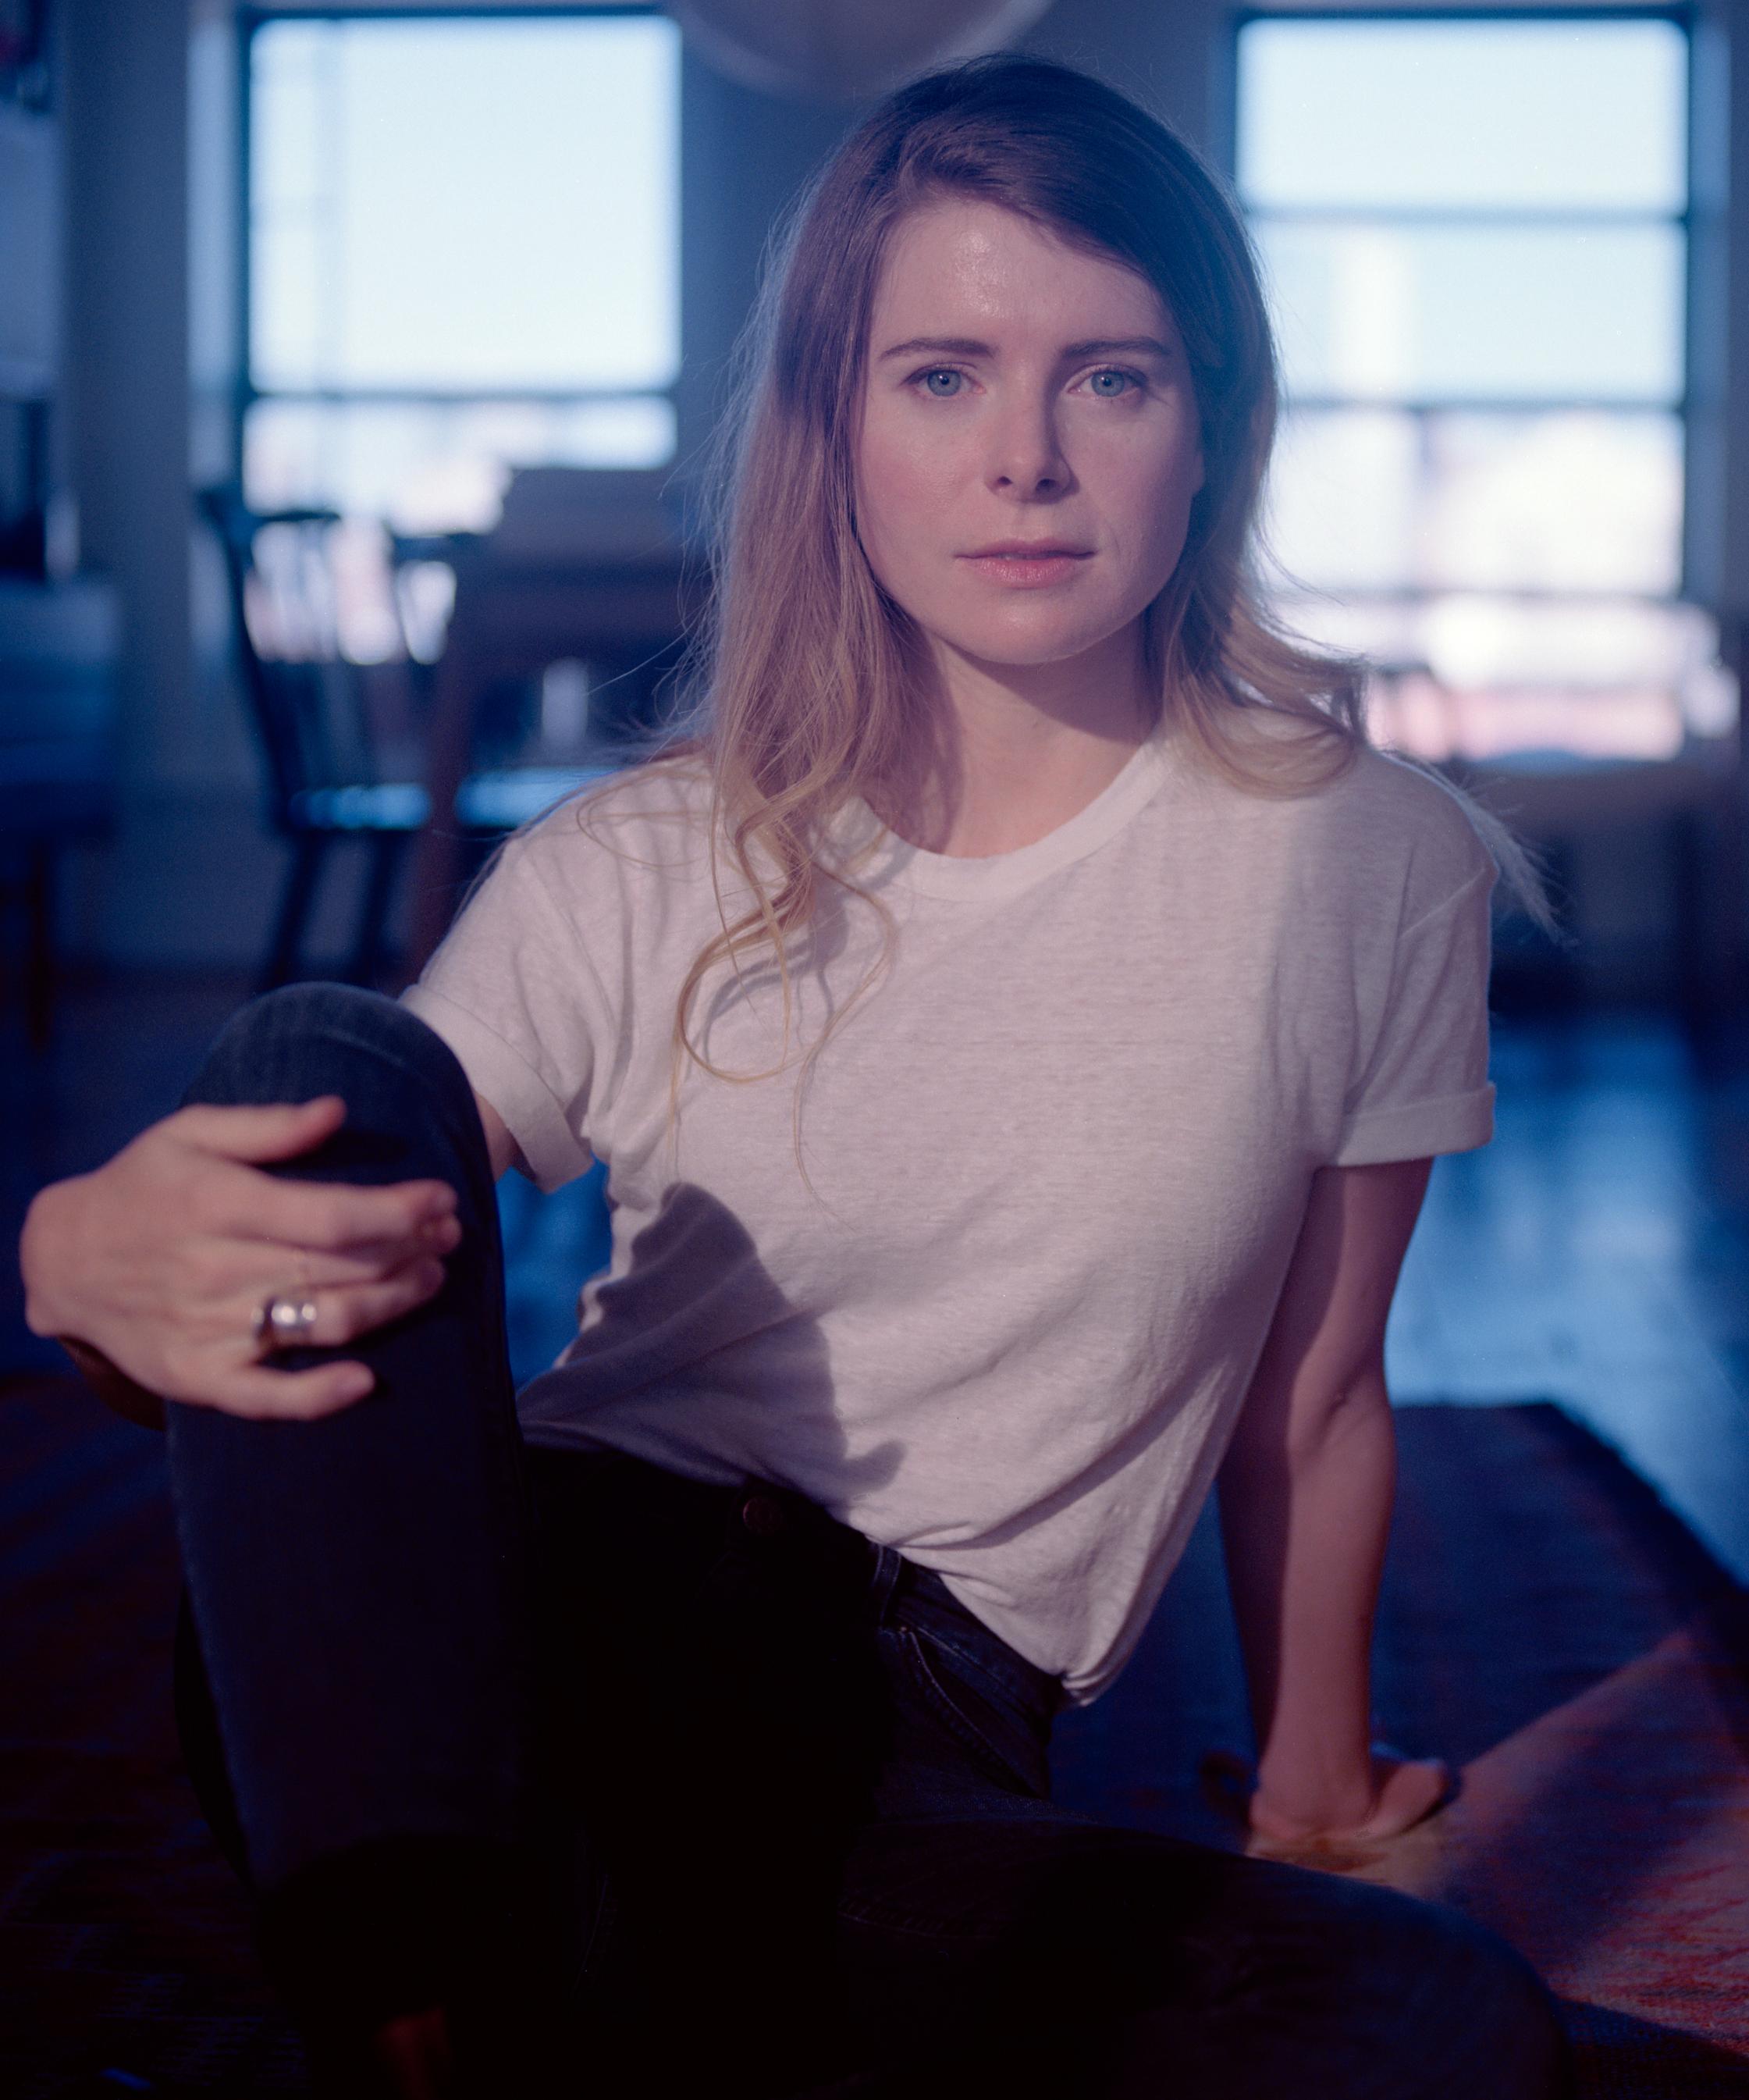 29bf02cbbe5 Author Emma Cline on 'The Girls' Novel – Rolling Stone